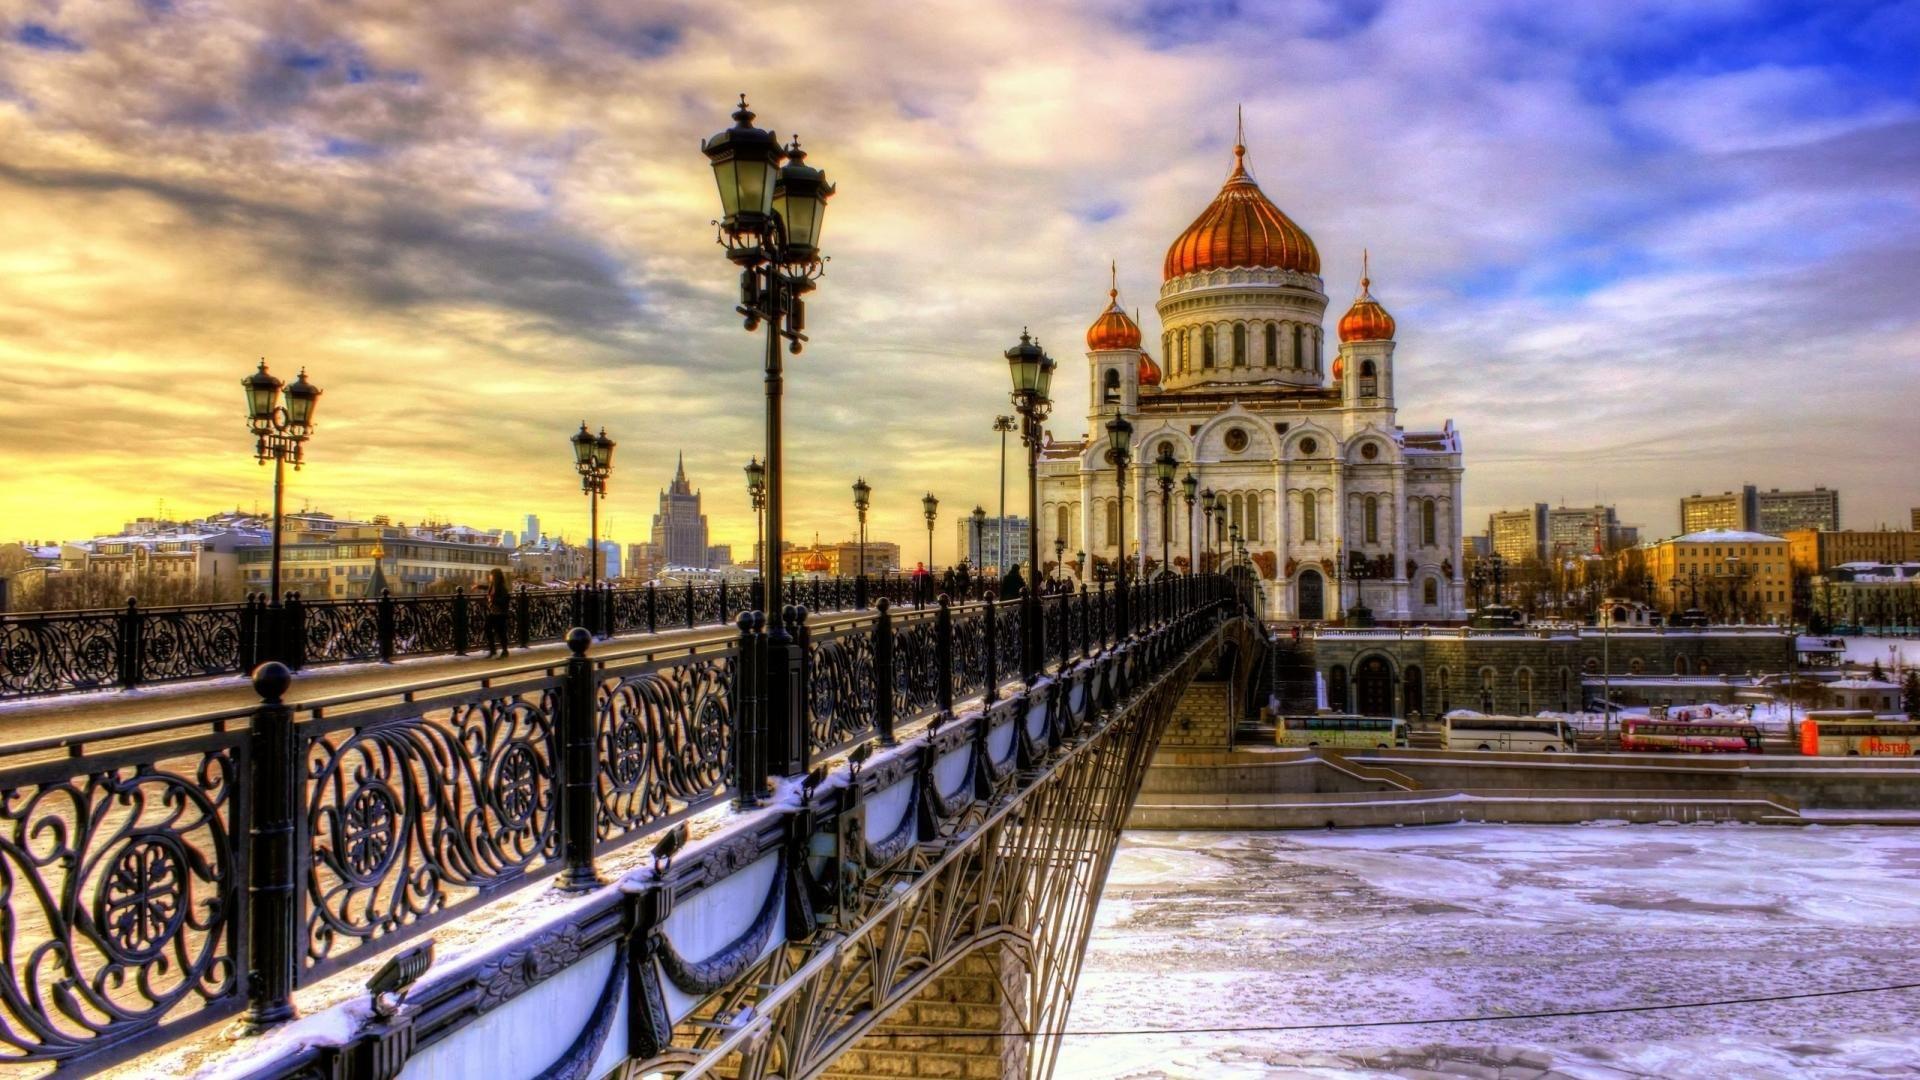 A Bridge To A Beautiful Church In Winter Hdr Hd Wallpaper